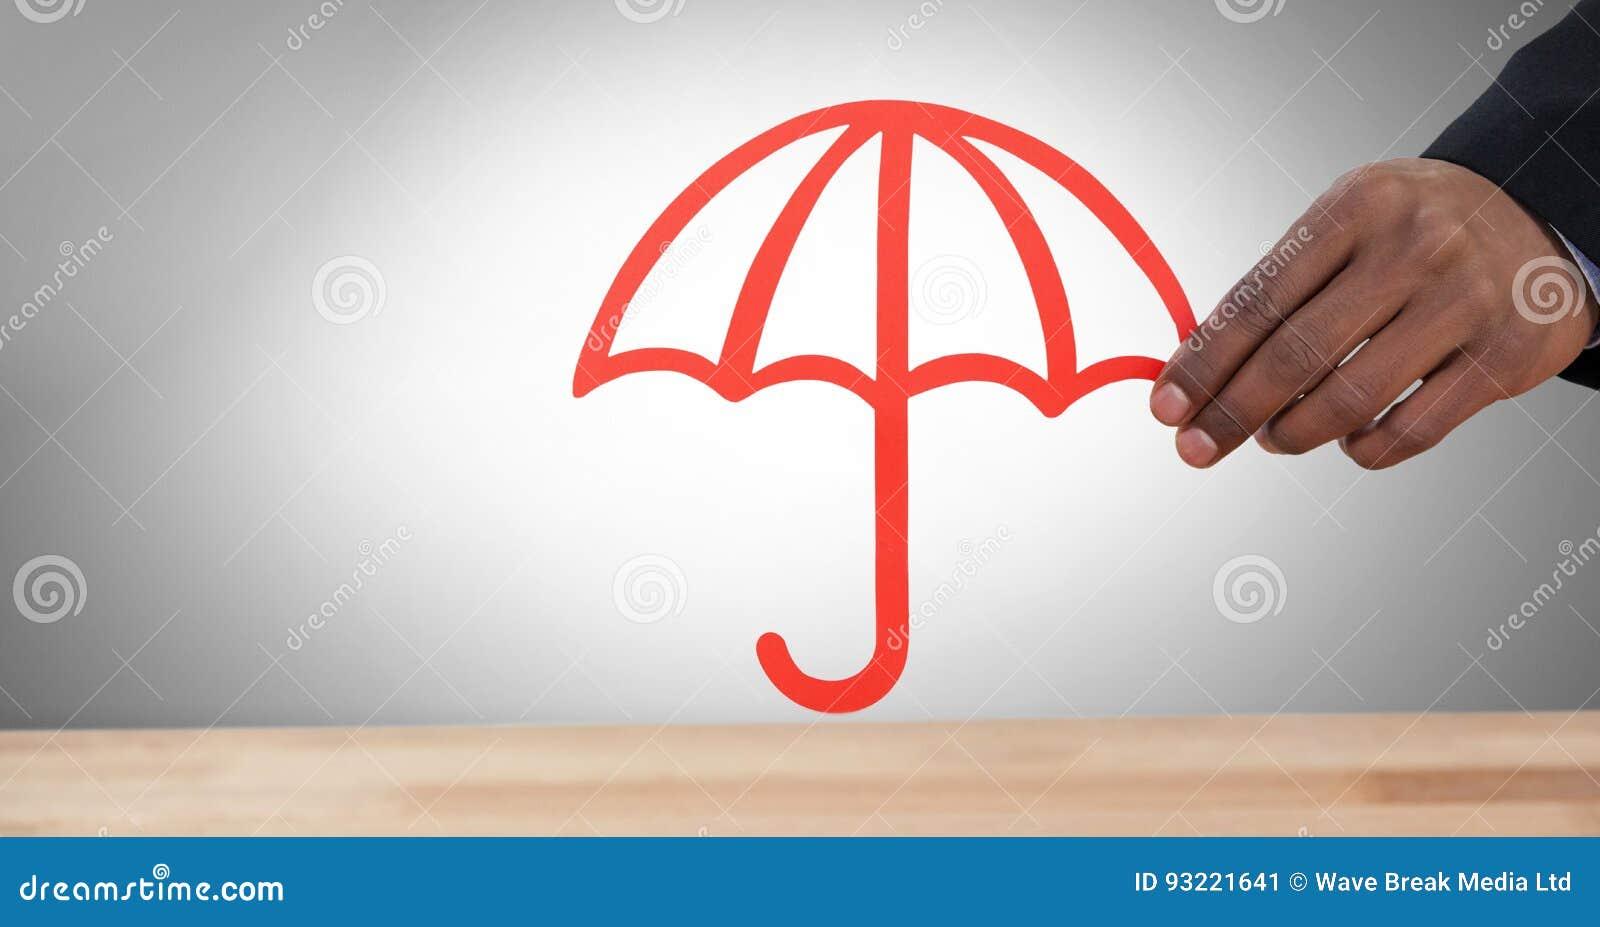 Cut Out Umbrella In Hand